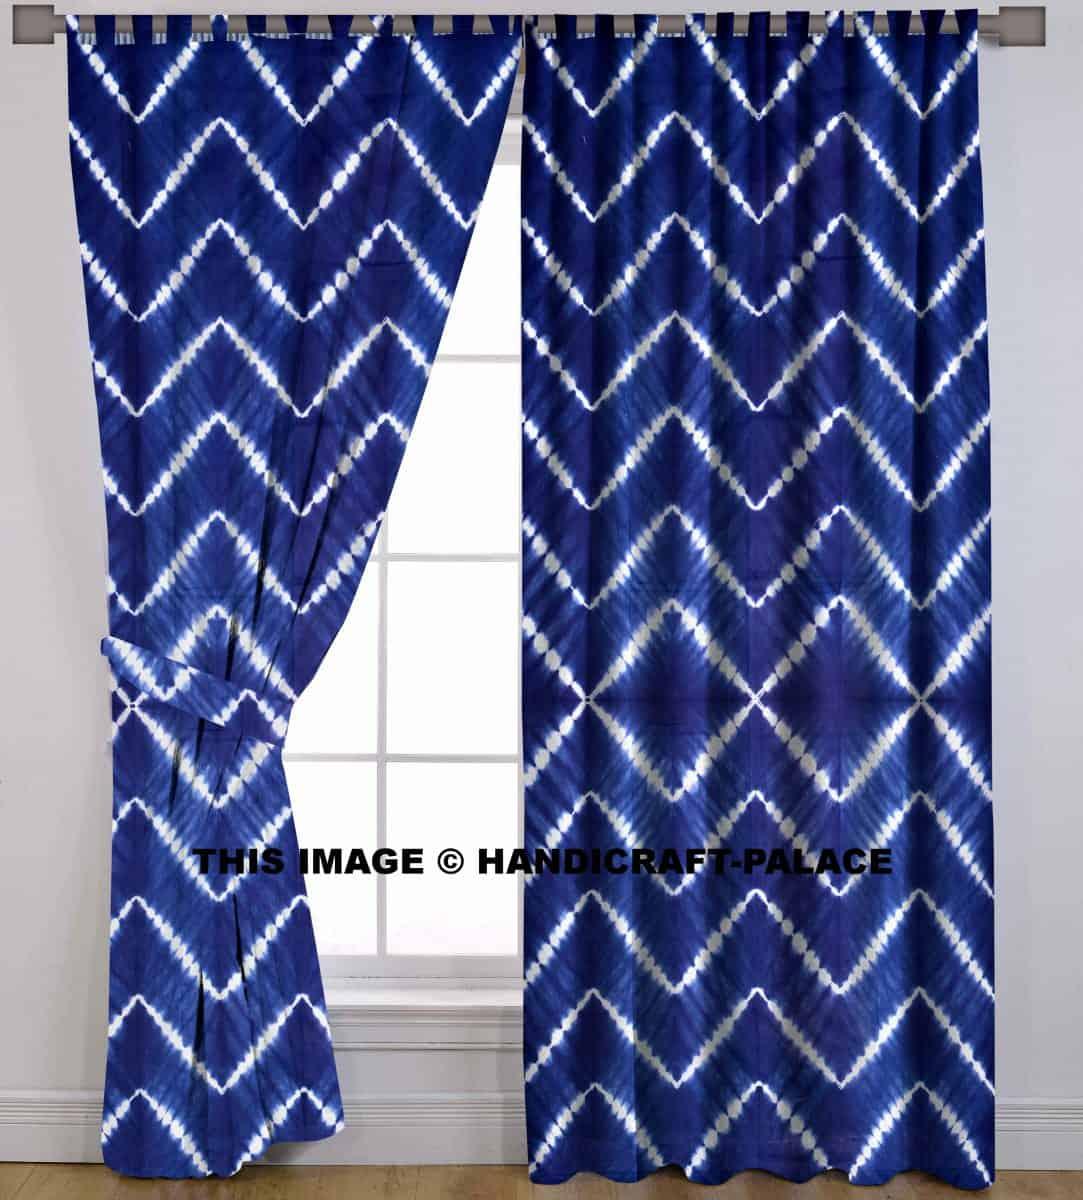 Tie Dye Shibori Cotton Handmade Curtain Handicraft Palace